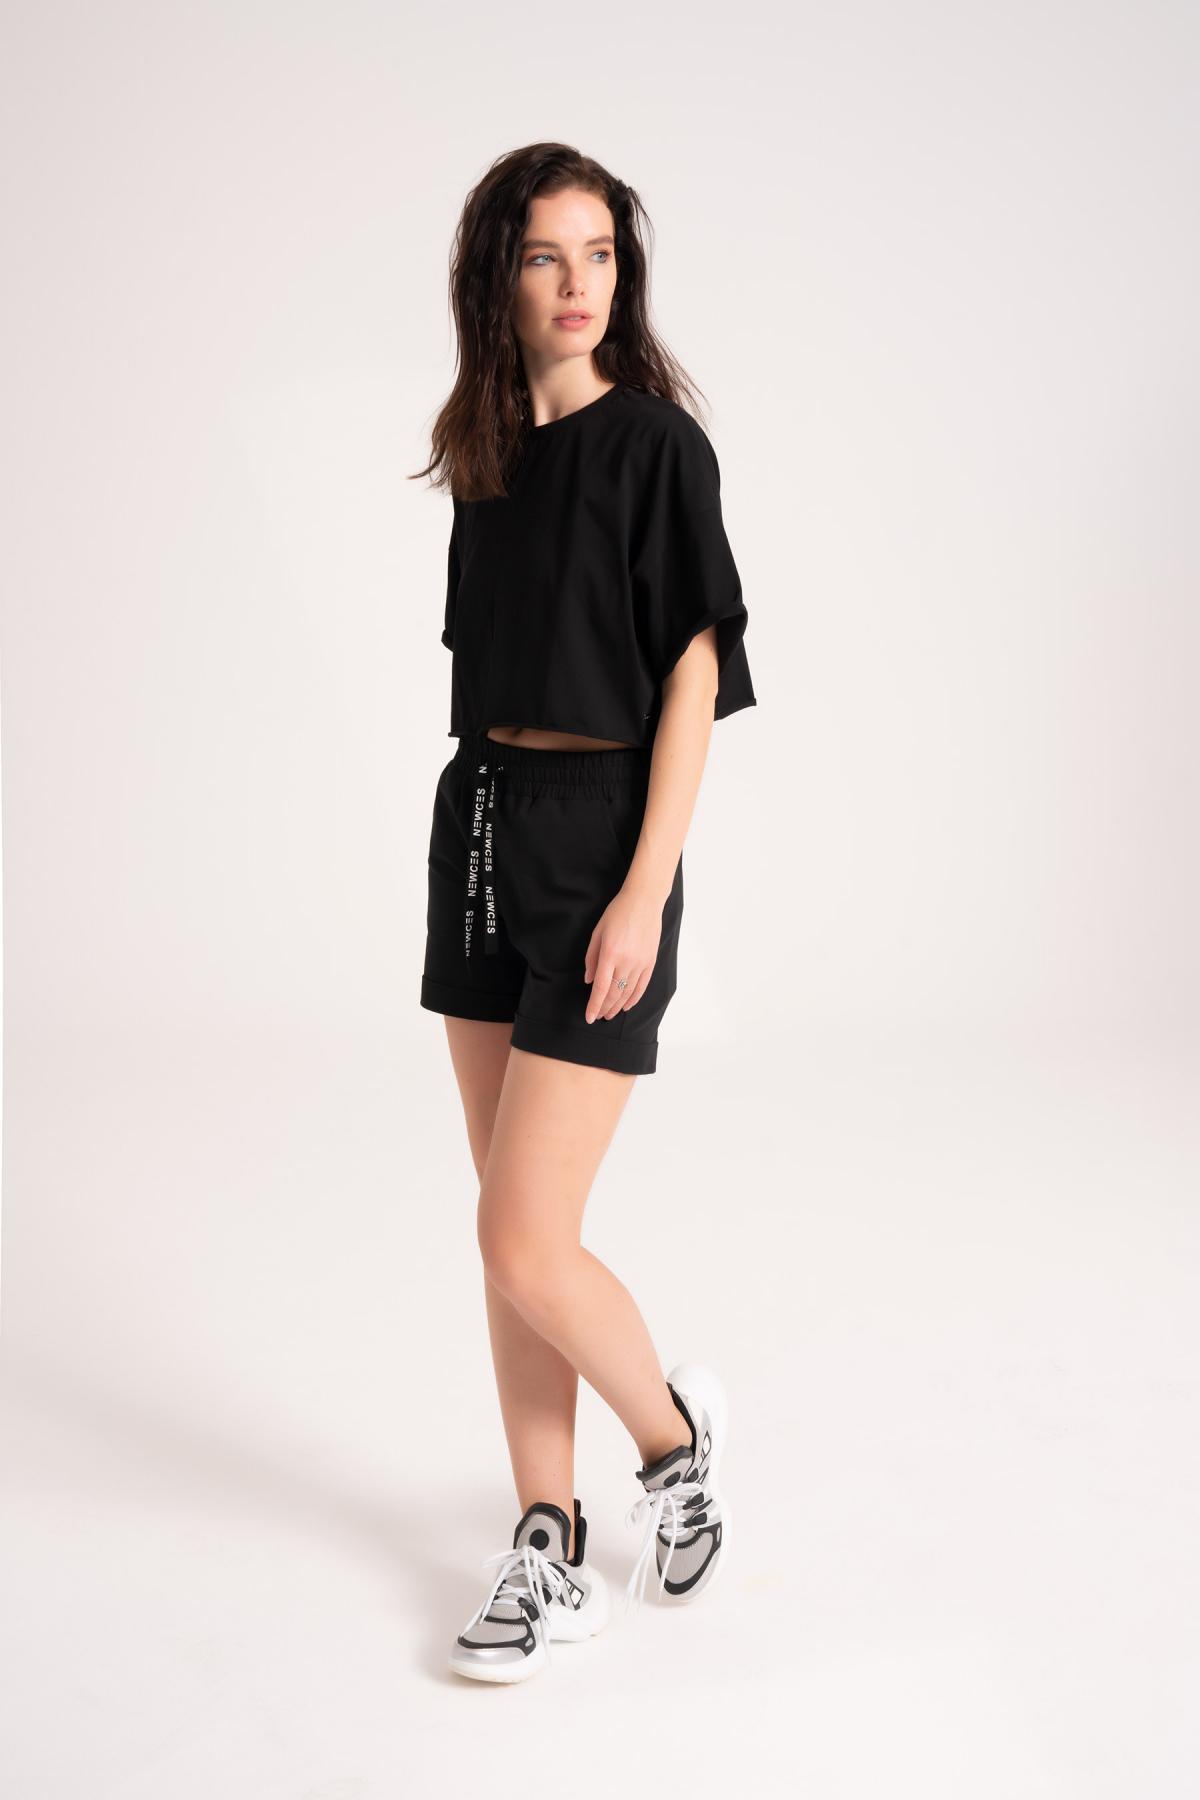 95% Cotton Shorts Womens newces-1005-B